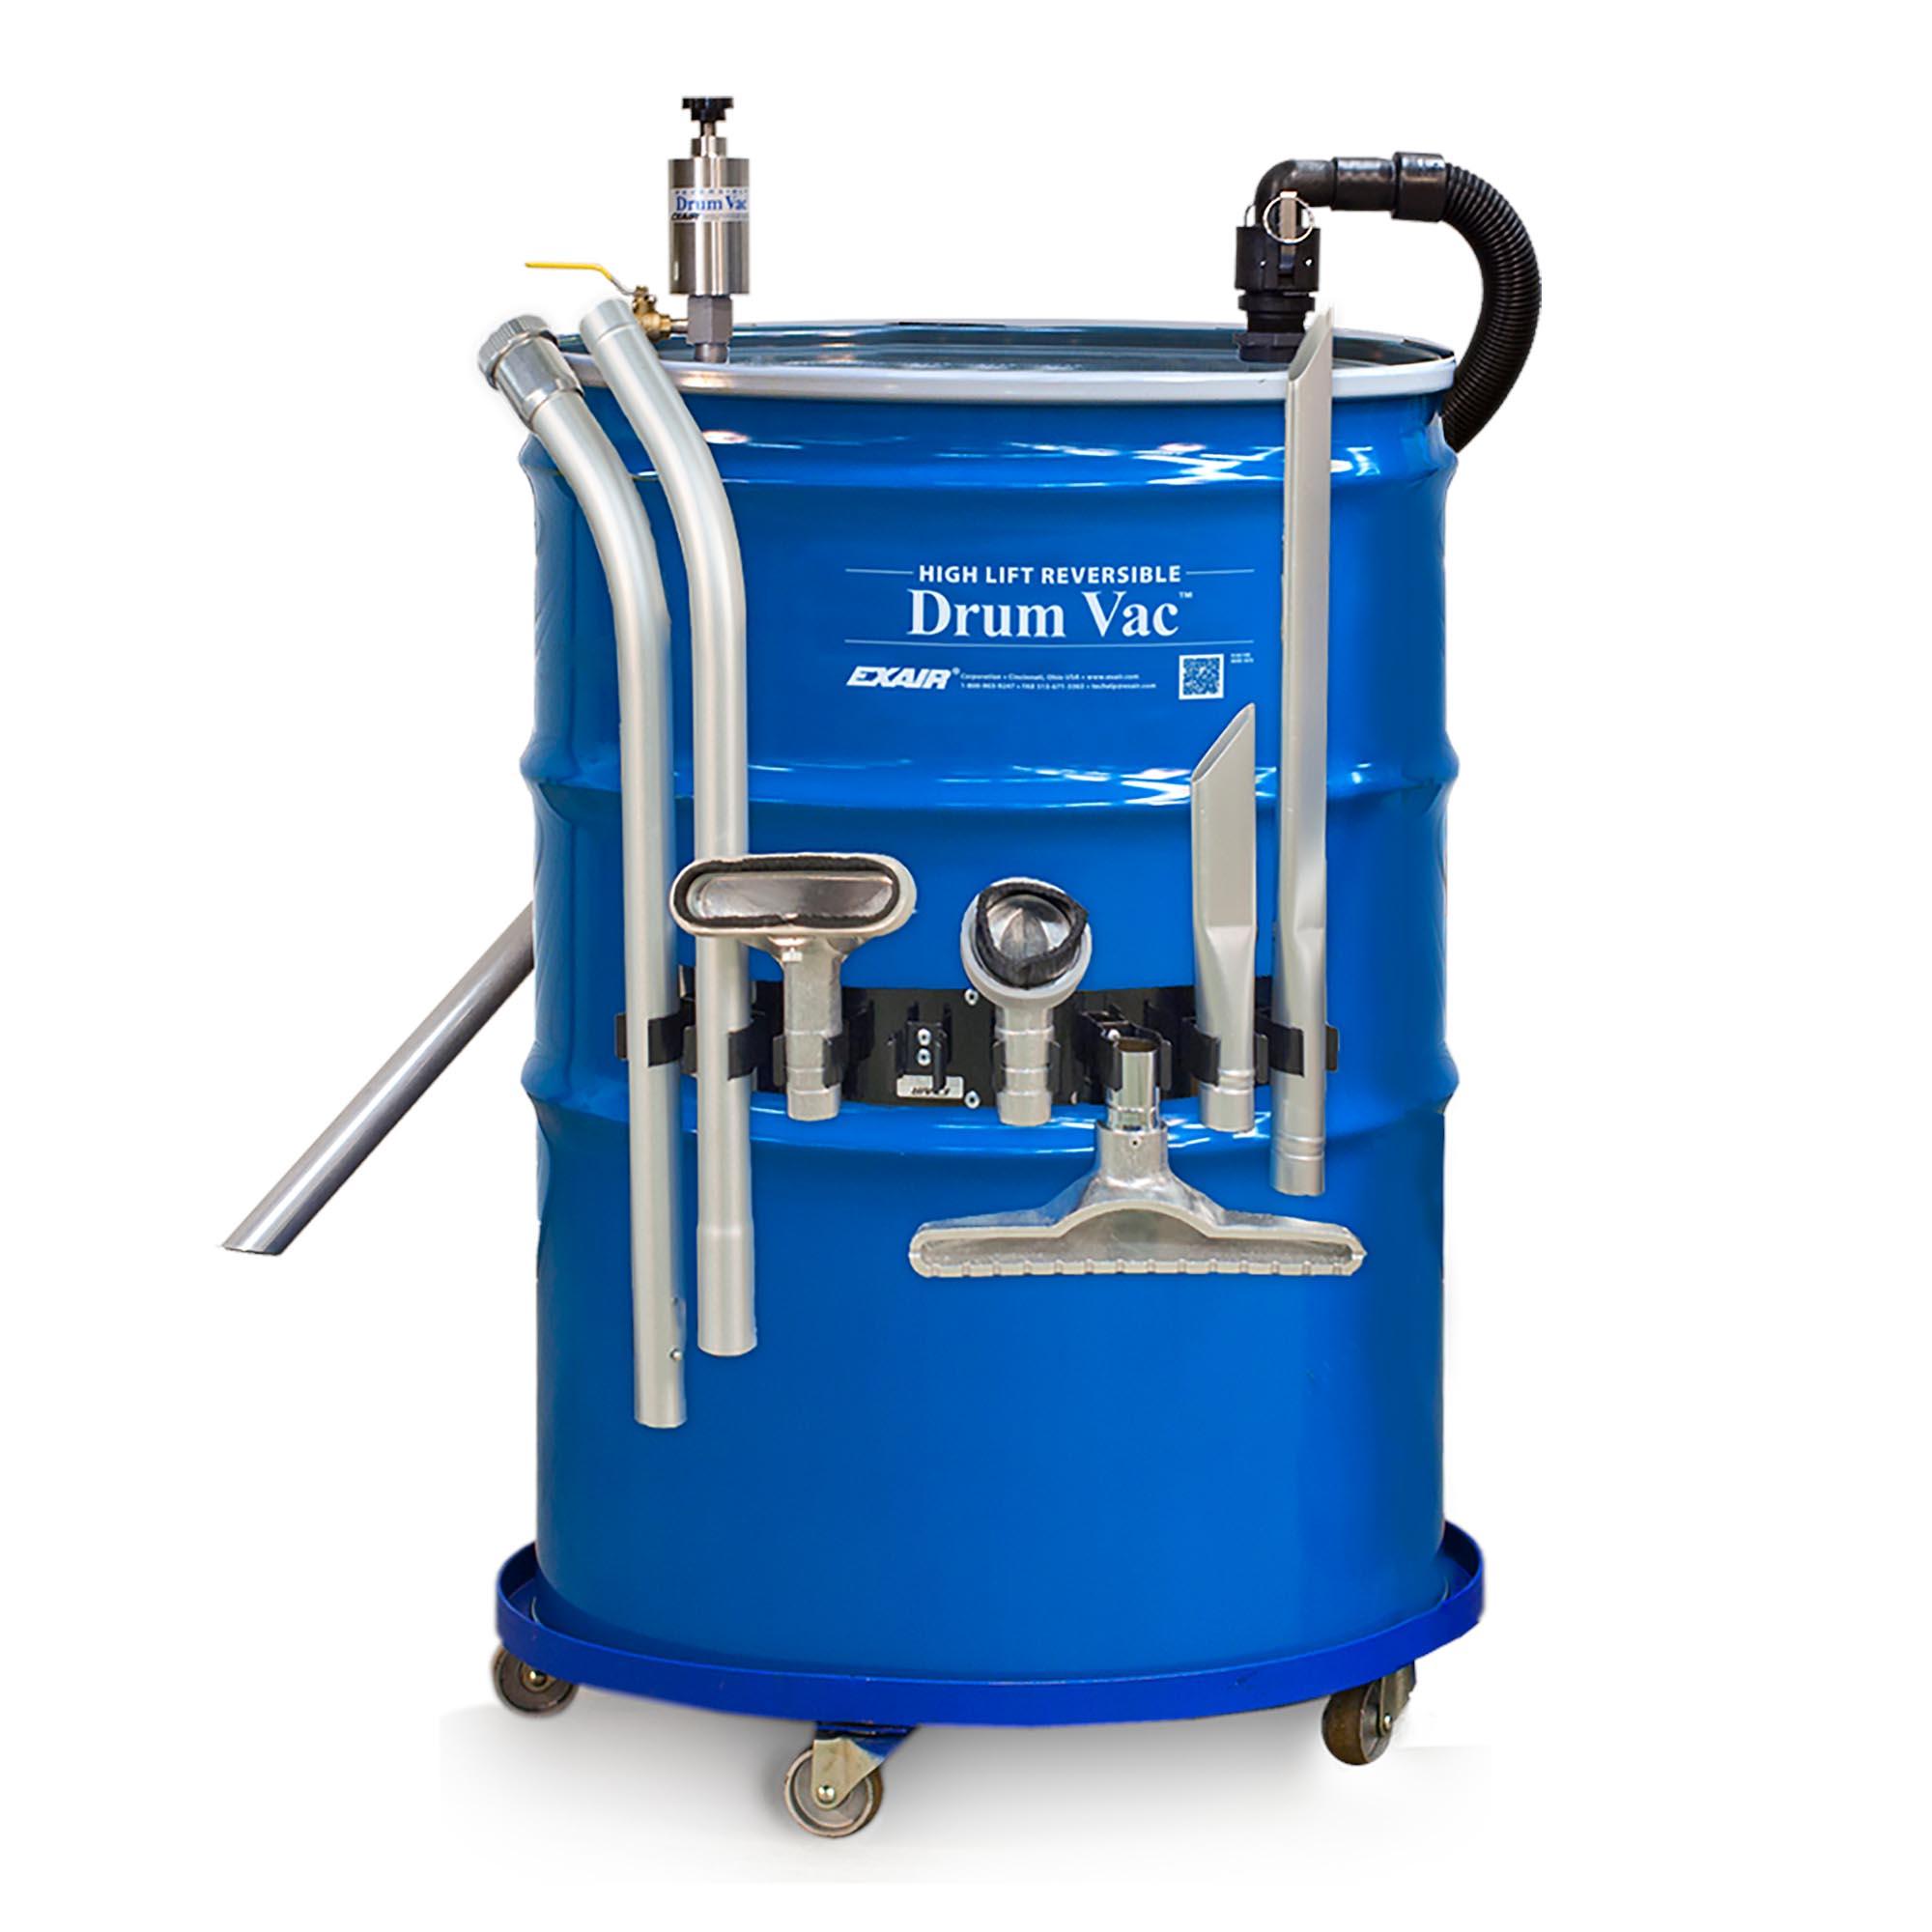 Model 6395-110 110 Gallon High Lift Premium Reversible Drum Vac System